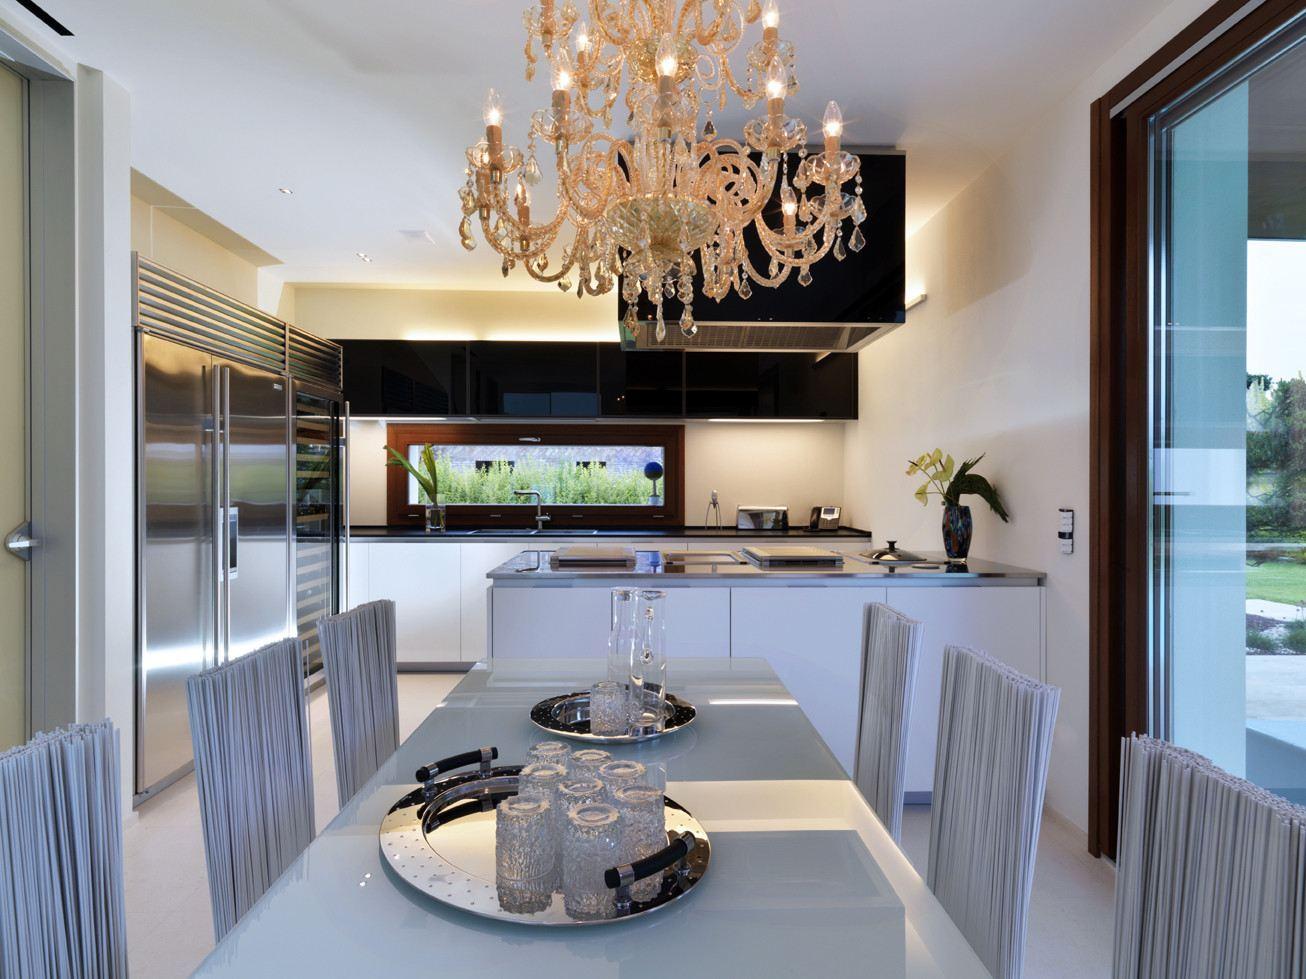 cucina - Mansarda.it